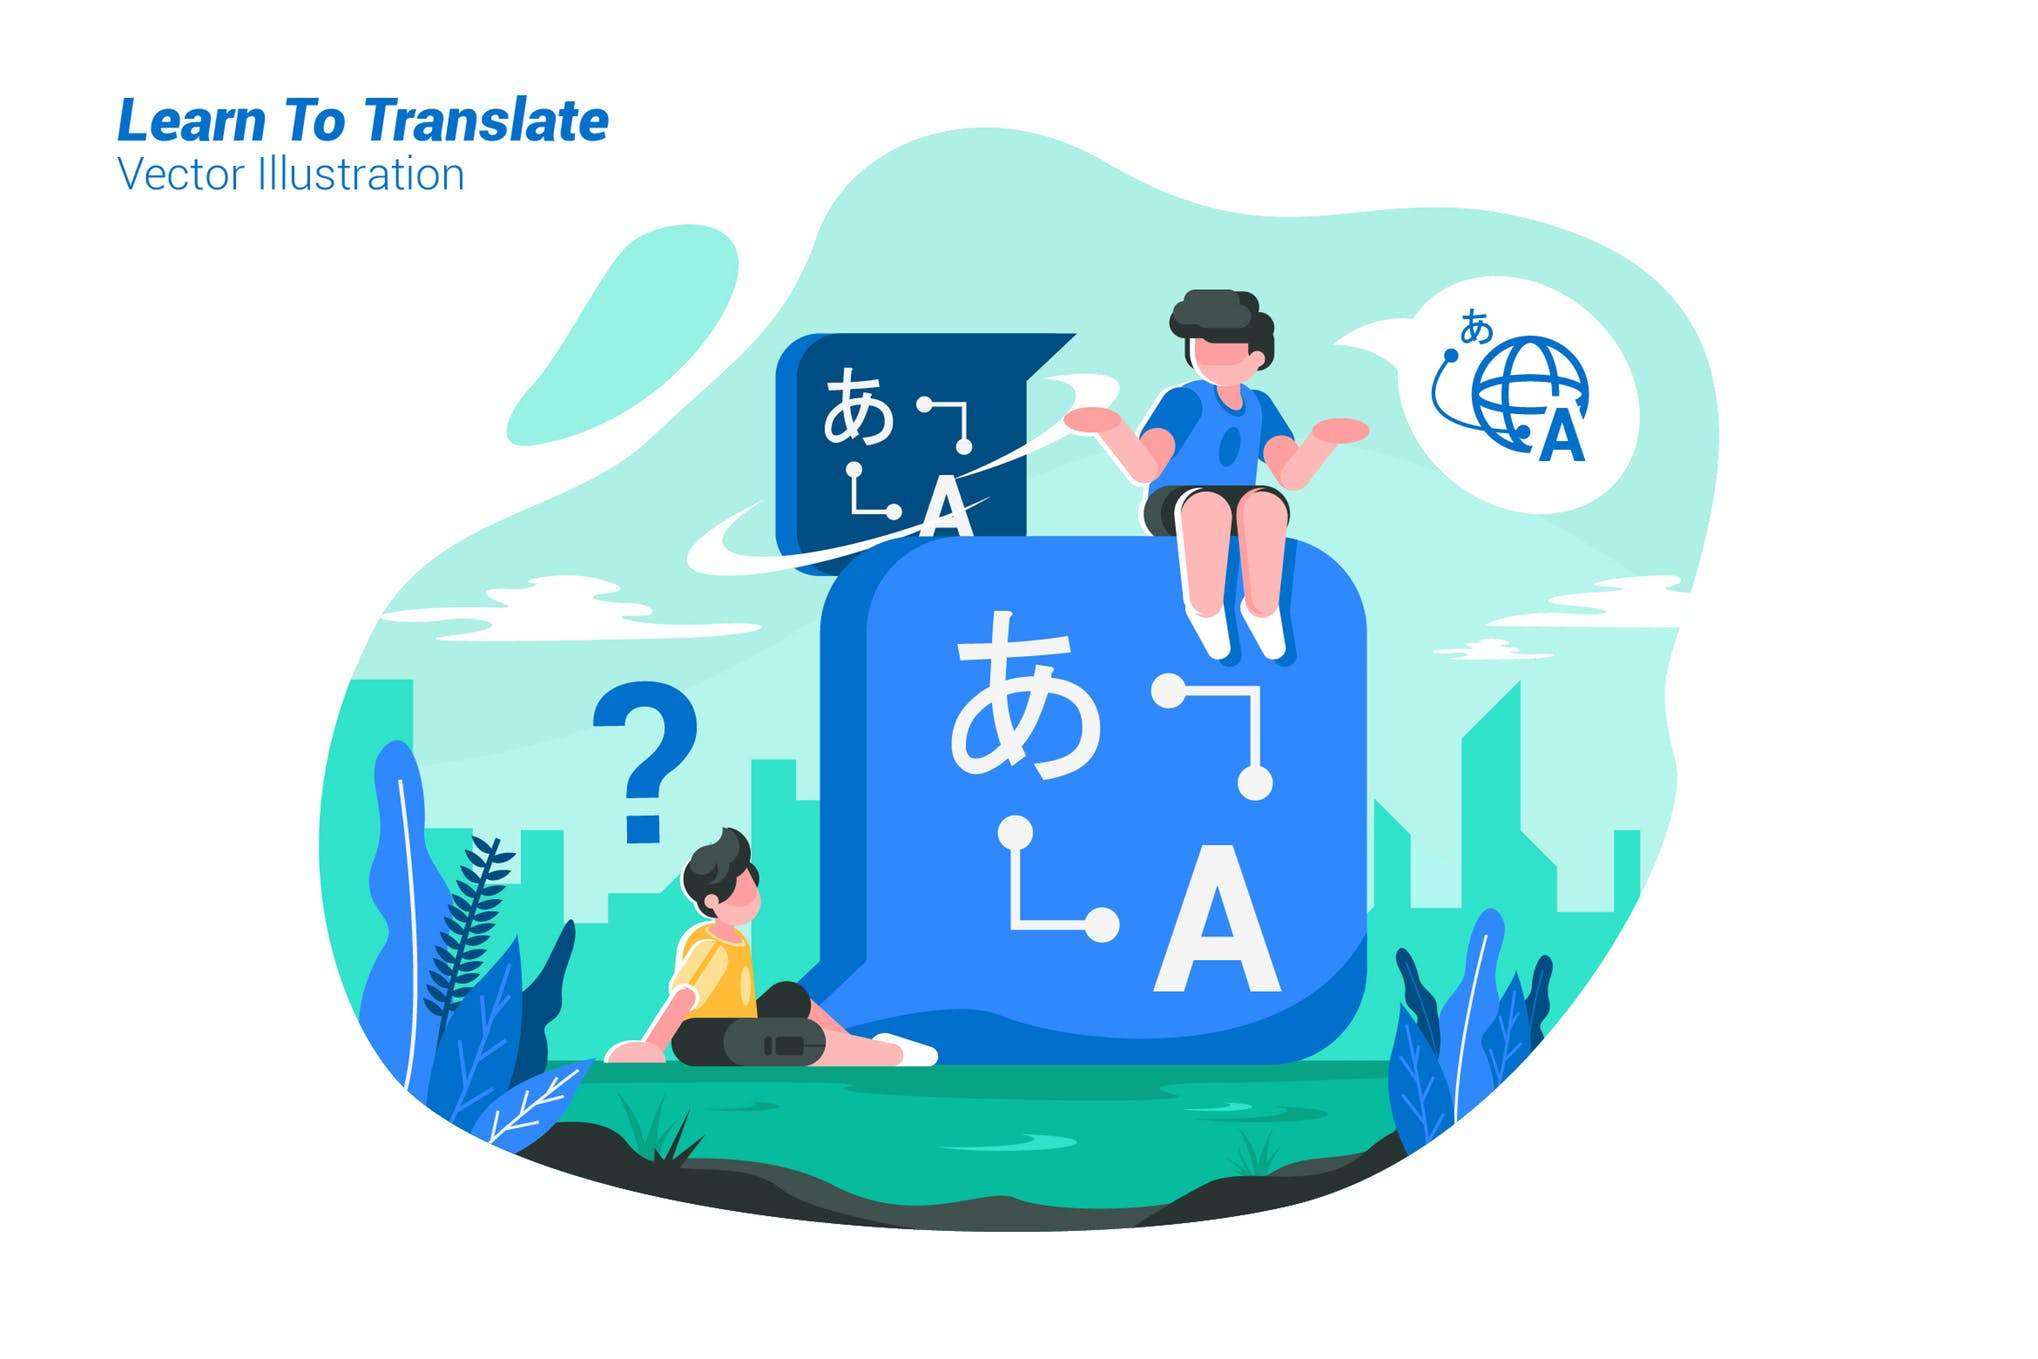 学习翻译场景插画素材模板素材下载Learn To Translate - Vector Illustration